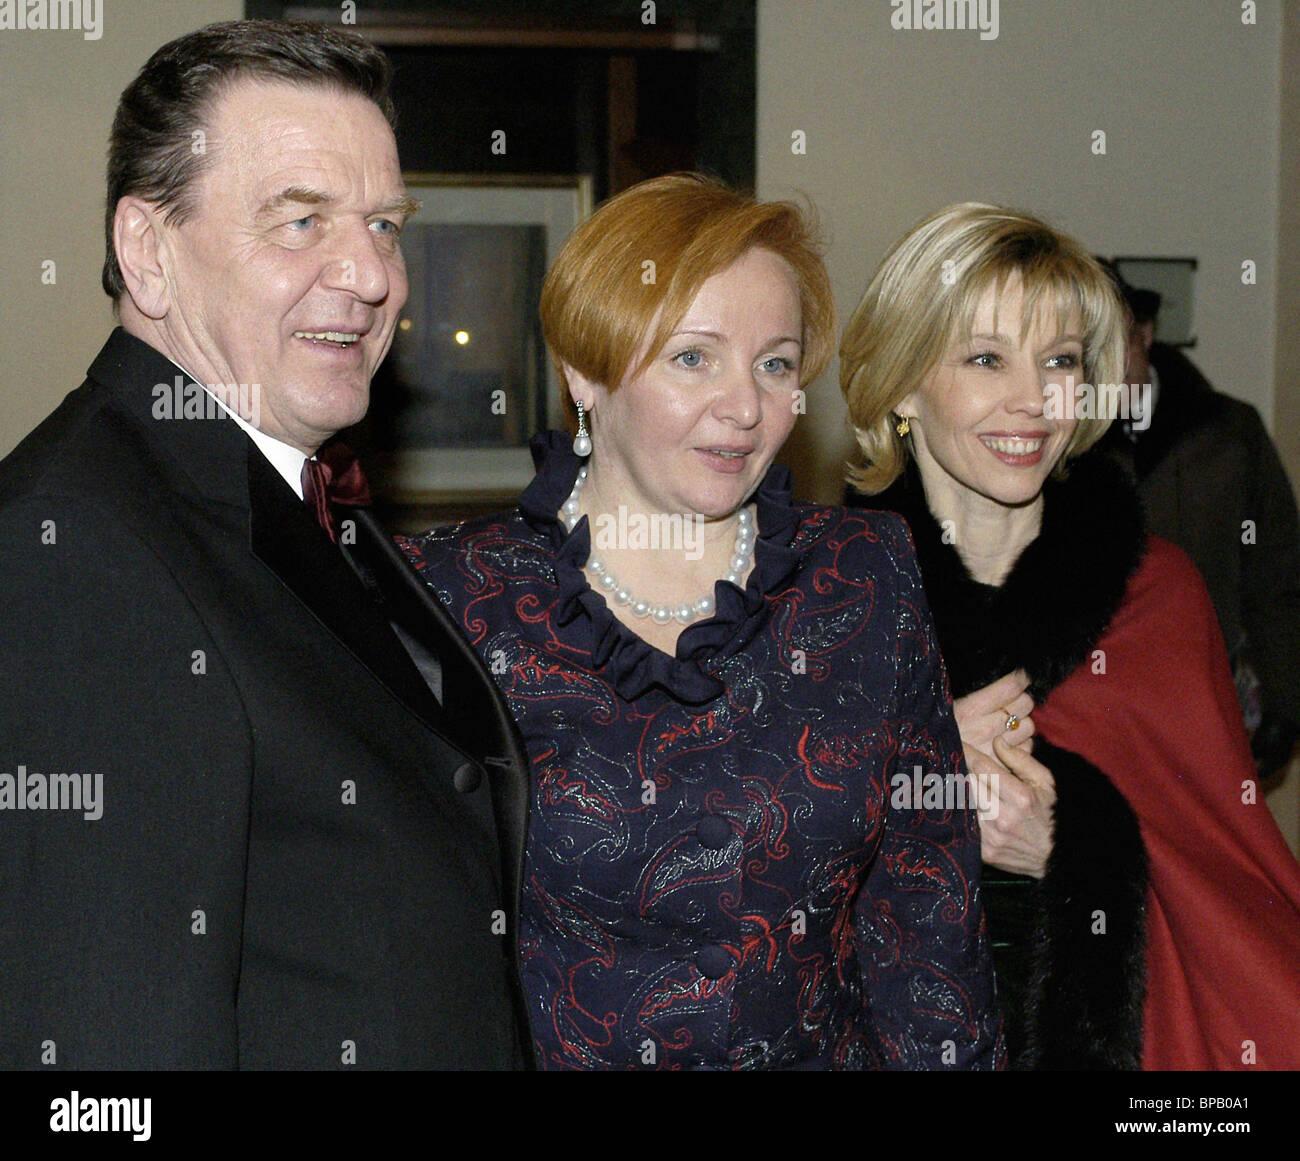 RussianPresidentsWifeLyudmilaPutinaVisitedGermany